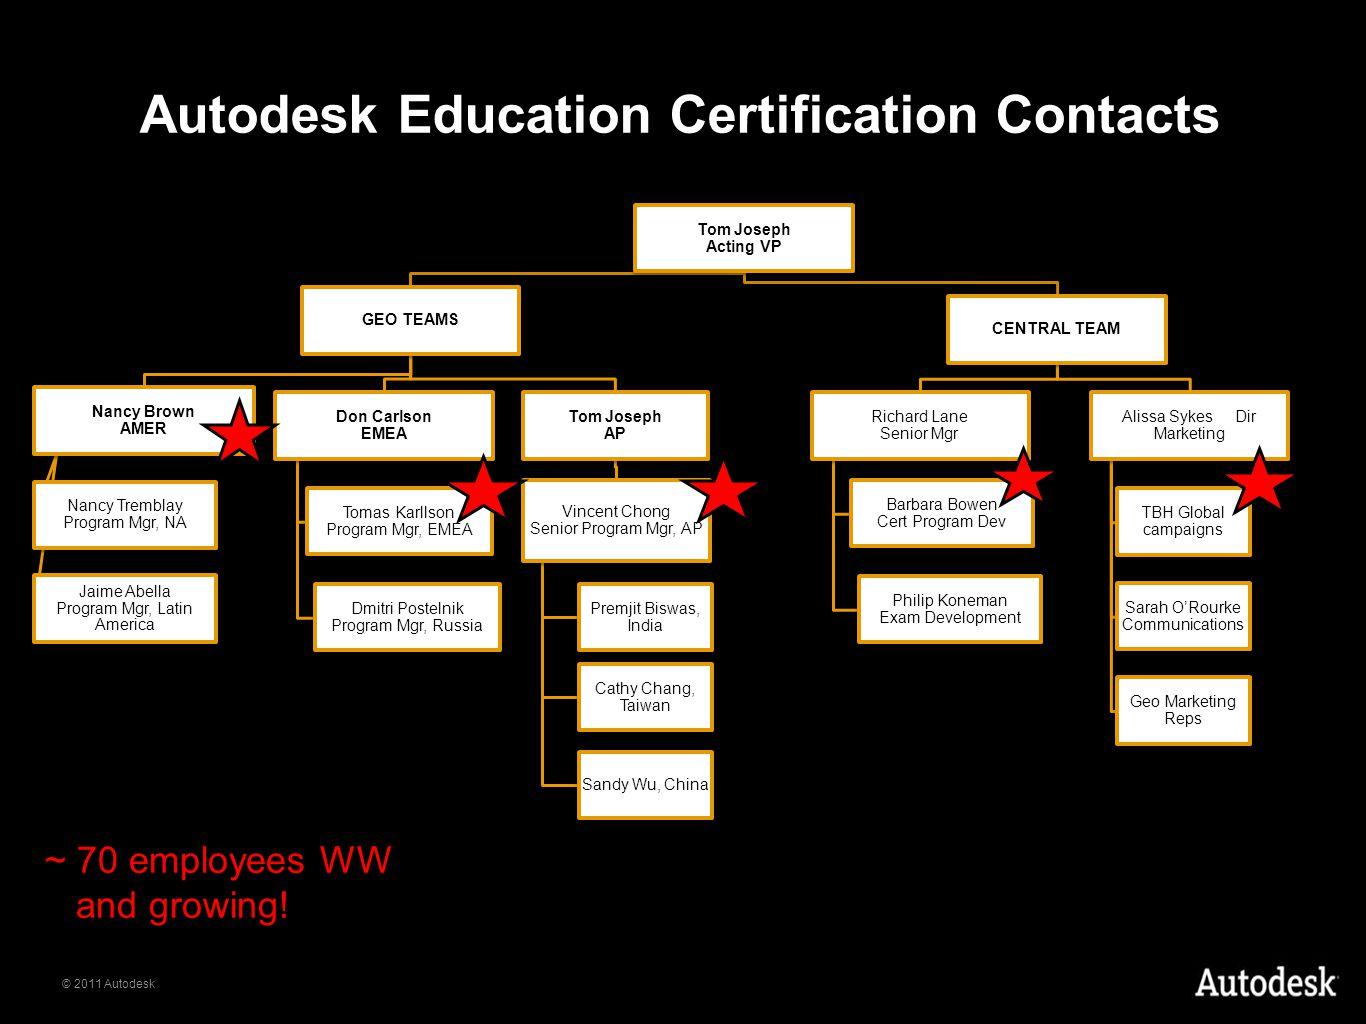 © 2011 Autodesk Autodesk Education Certification Contacts Tom Joseph Acting VP GEO TEAMS Nancy Brown AMER Nancy Tremblay Program Mgr, NA Jaime Abella